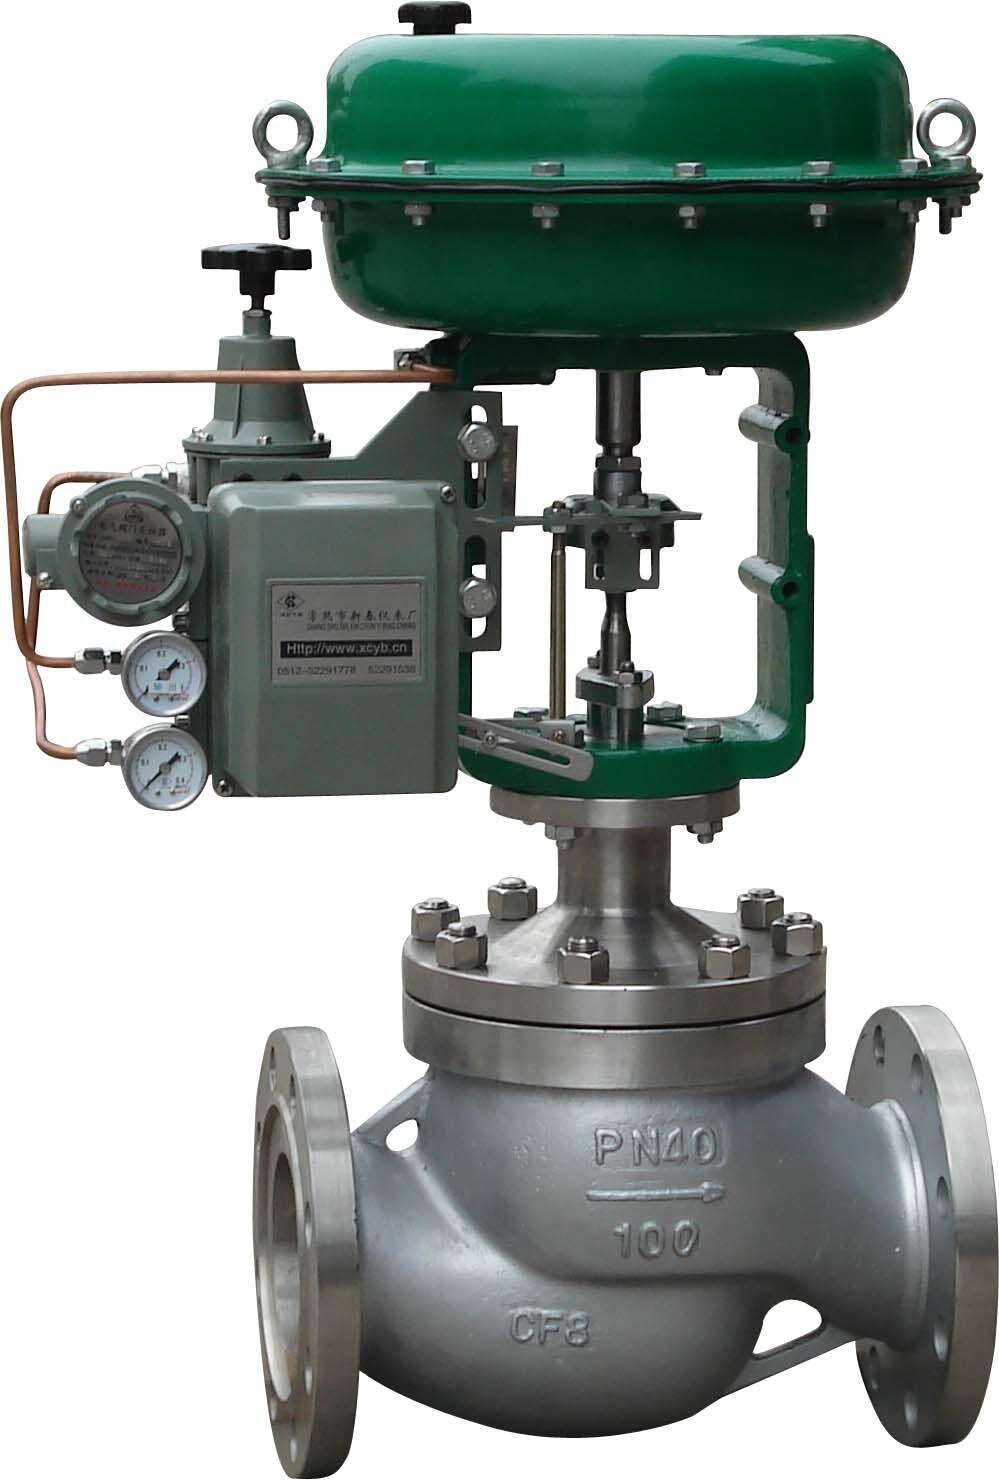 ZJHP(M)型气动单座(套筒)调节阀由气动多弹簧薄膜执行机构和低流阻直通单座阀(套筒阀)组成,单座阀阀体直通单座盖上导向结构,阀芯为柱塞型结构,与普通单座阀相比具有体积小,重量轻,流量大等特点适用于流量大,泄漏量要求严格的场合。ZJHM型精小型套筒与普通套筒阀相比,具有体积小1/3,重量轻1/3,流量大1/3的特点,广泛应用于要求噪音低、压差大的工业过程自动控制系统中。 一、阀体 阀体形式:直通单座(套筒)倒S型铸造型阀 公称通径:DN20~300mm 公称压力:PN1.